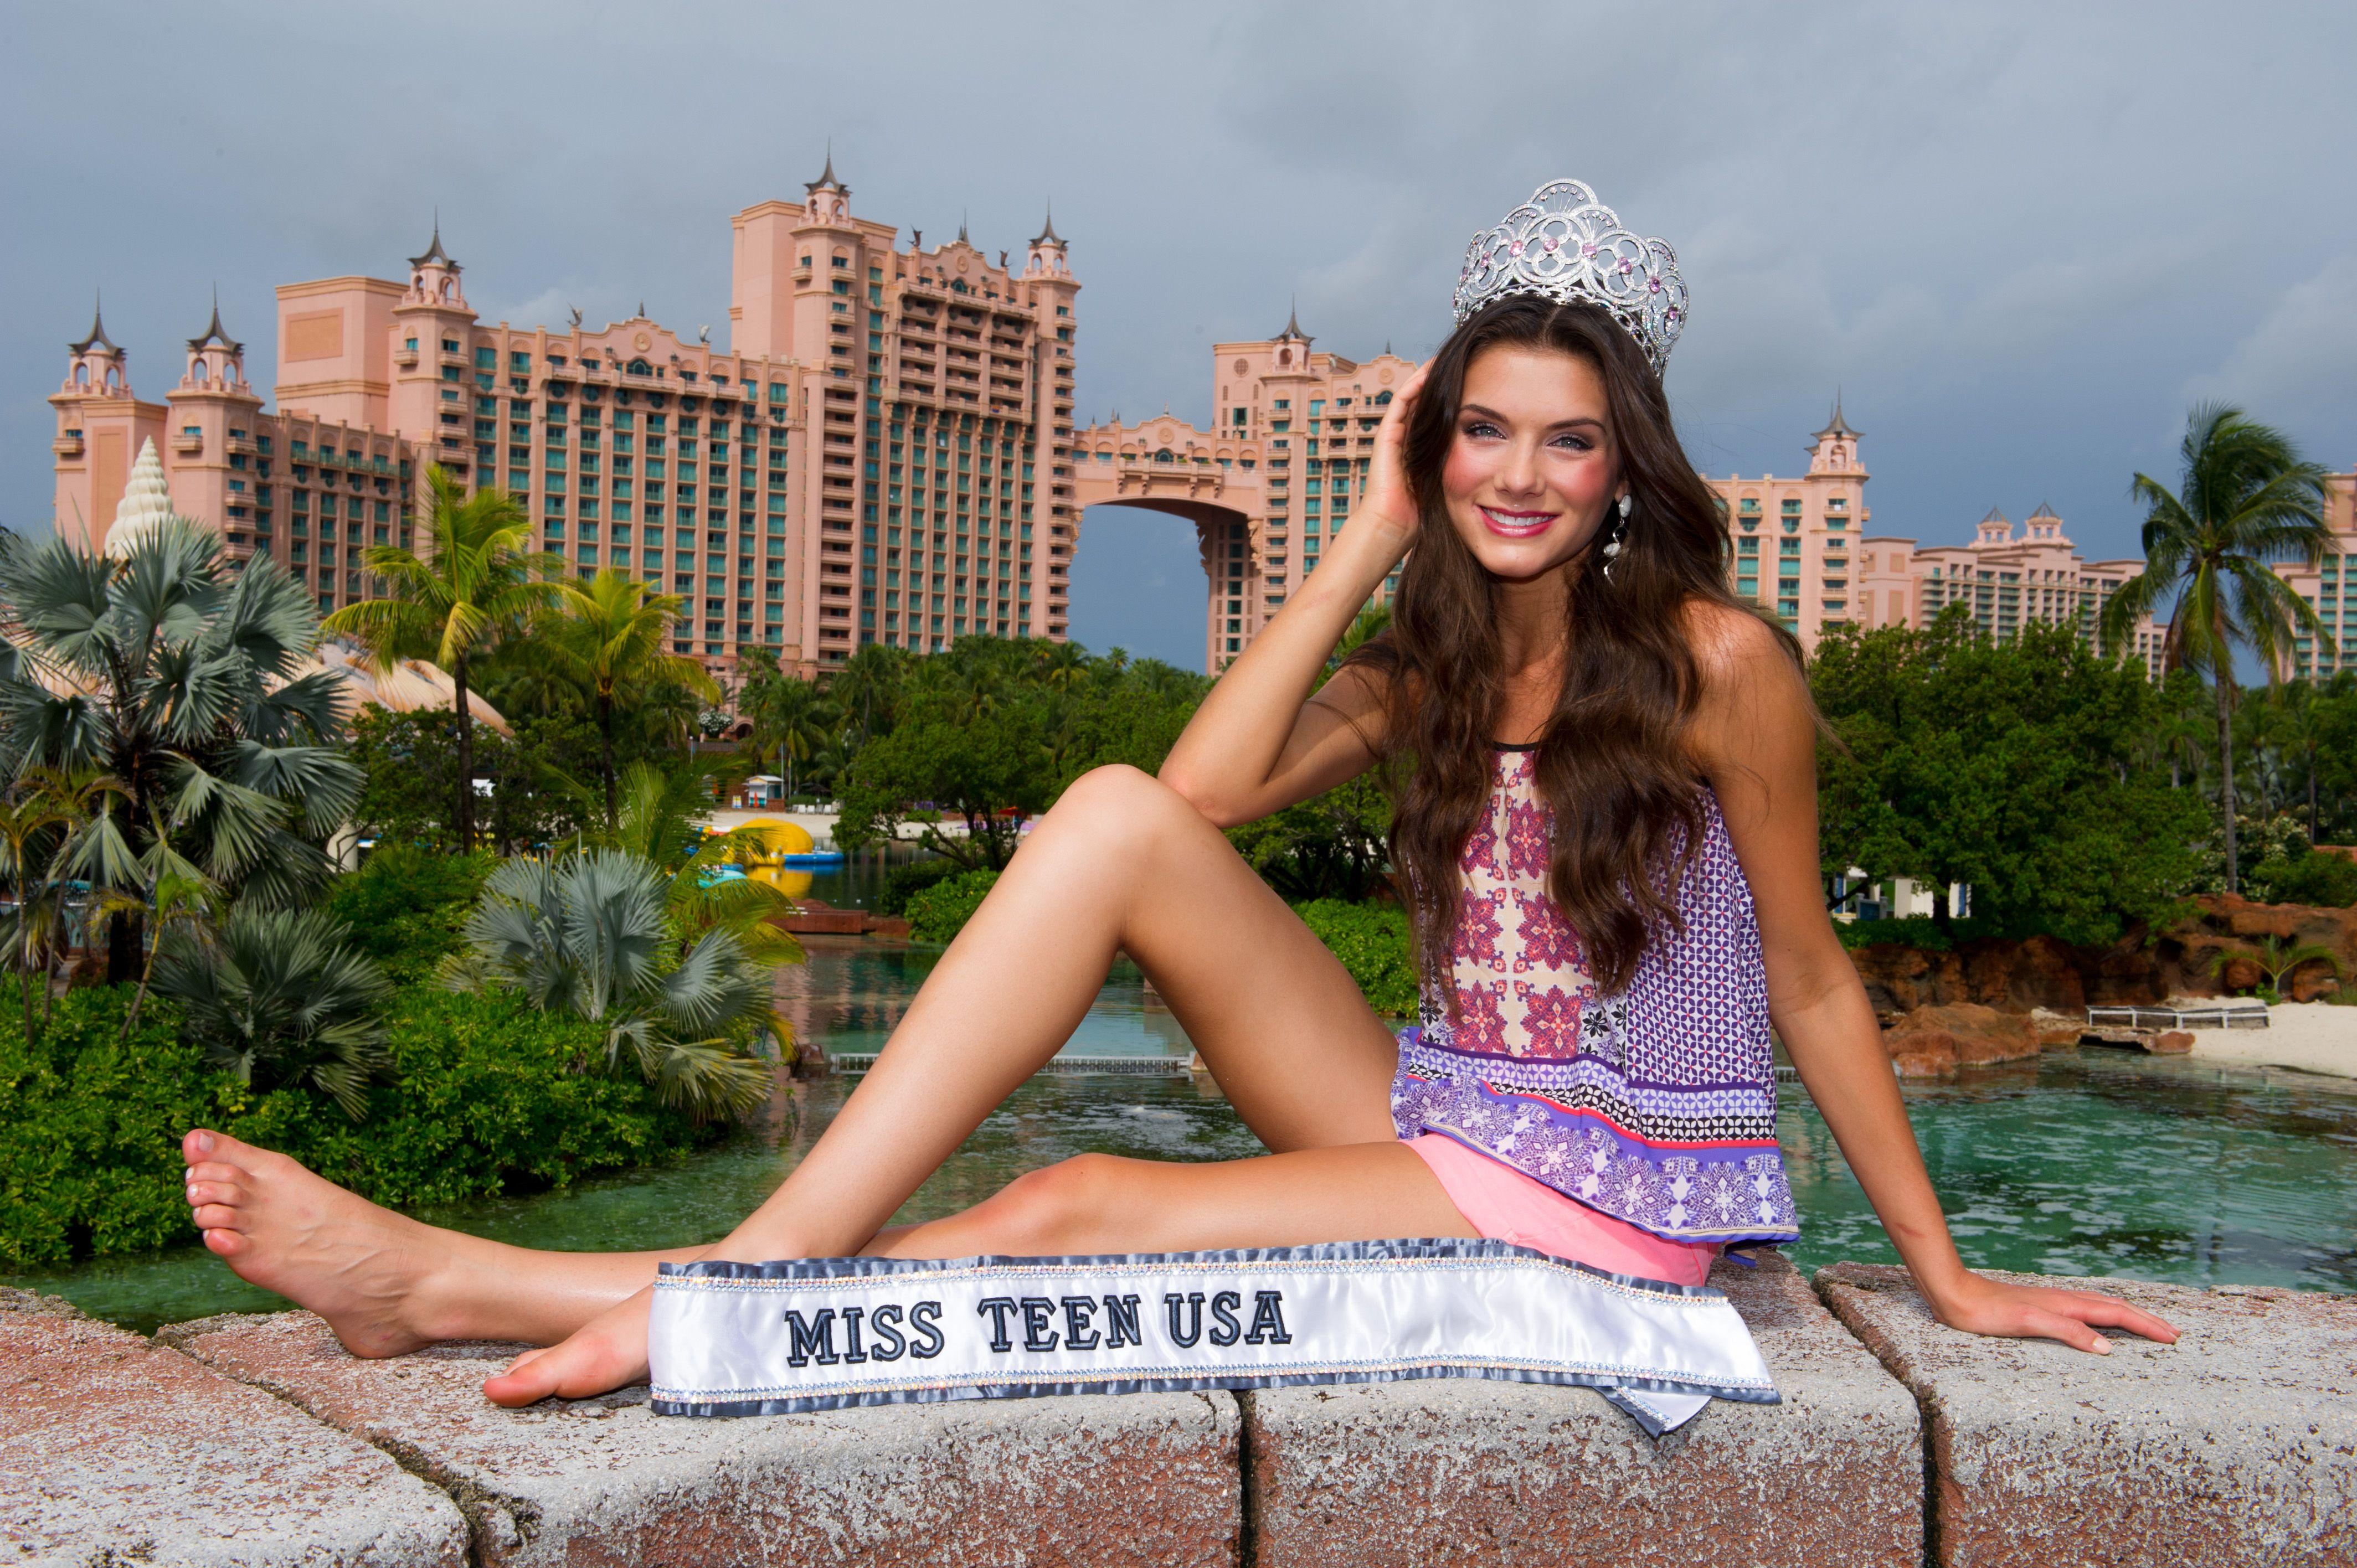 Congratulations to #K.LeeGraham on being crowned #MissTeenUSA 2014!